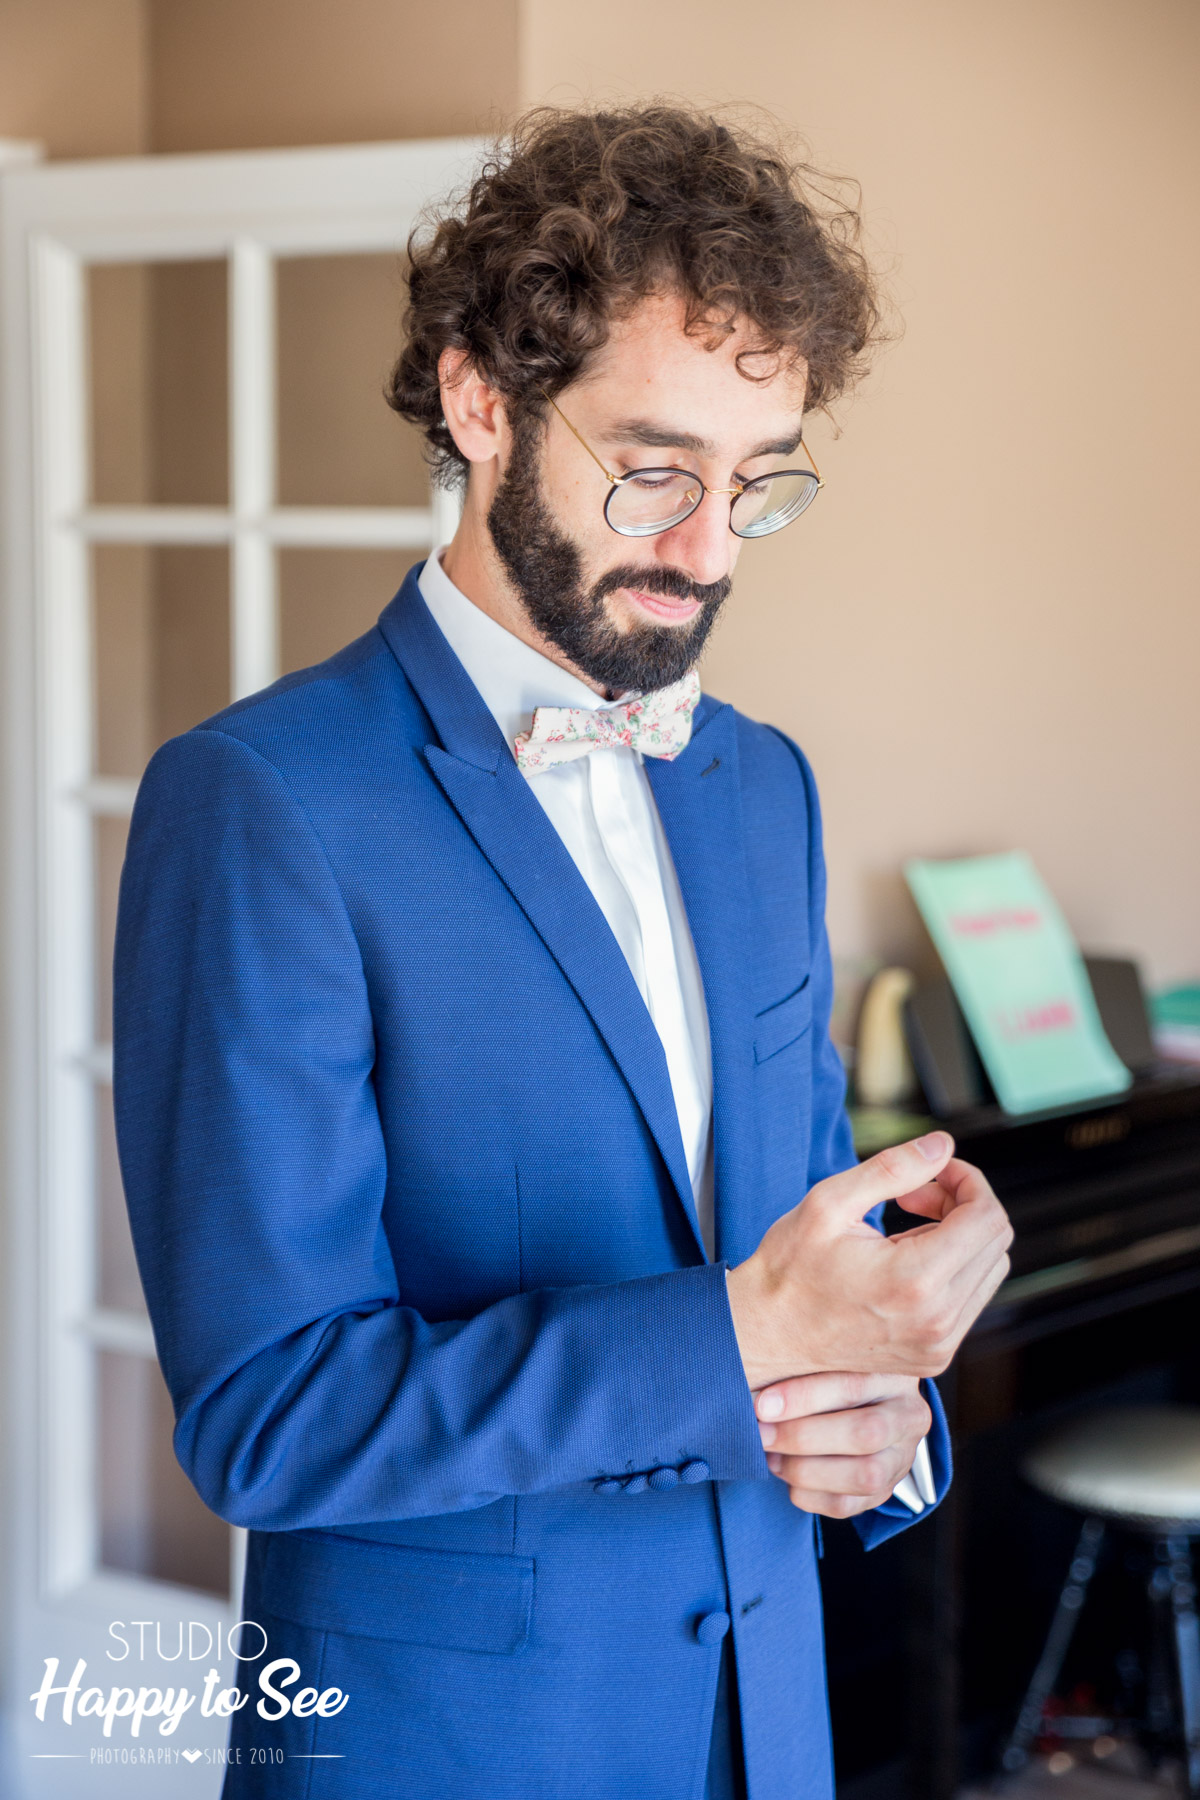 costume bleu de mariage Chouraki le pape